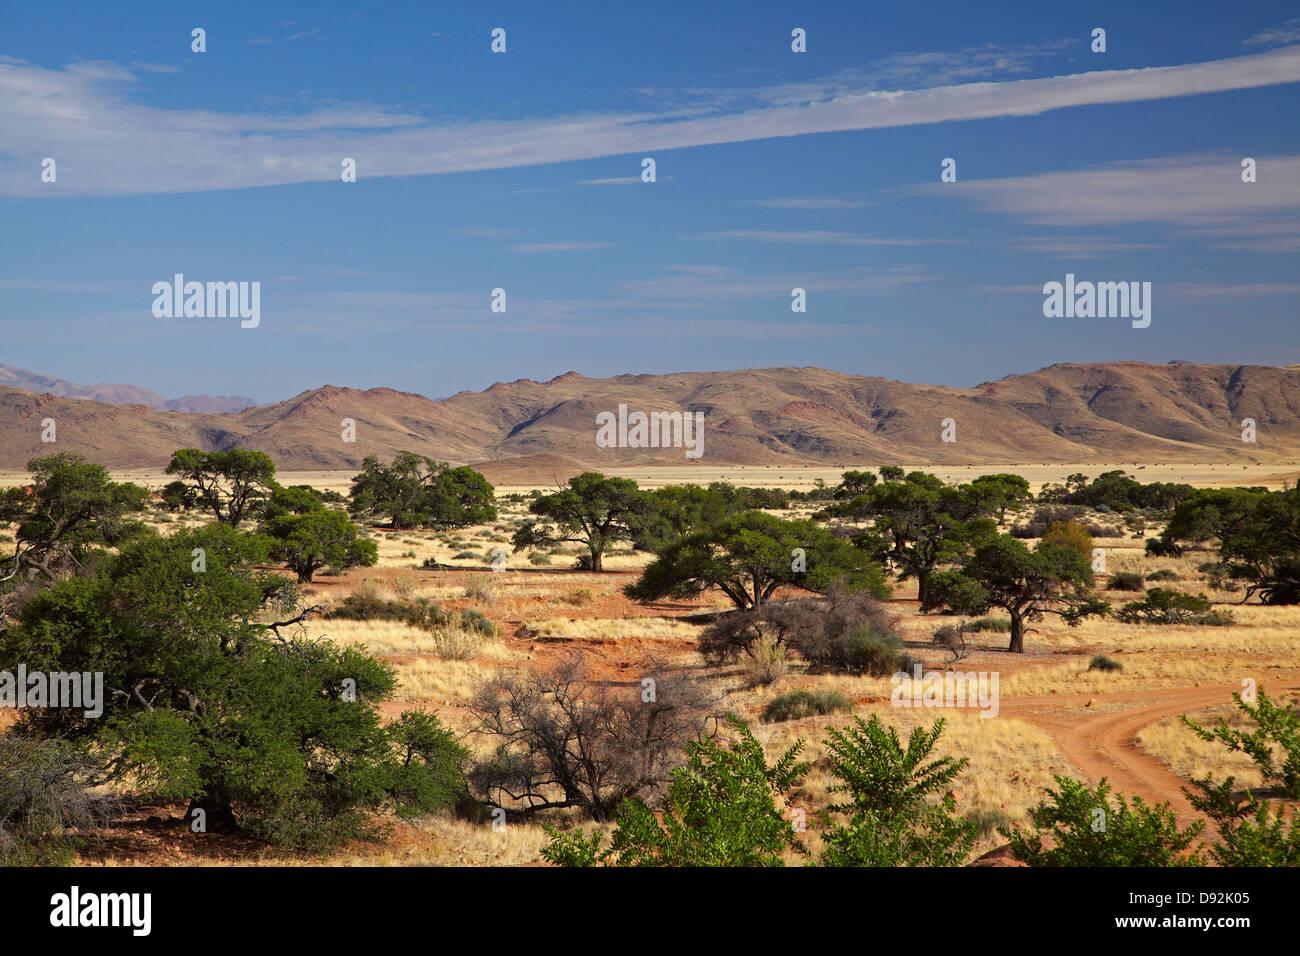 Ranch Koiimasis, Tiras Mountains, Southern Namibia, Africa - Stock Image